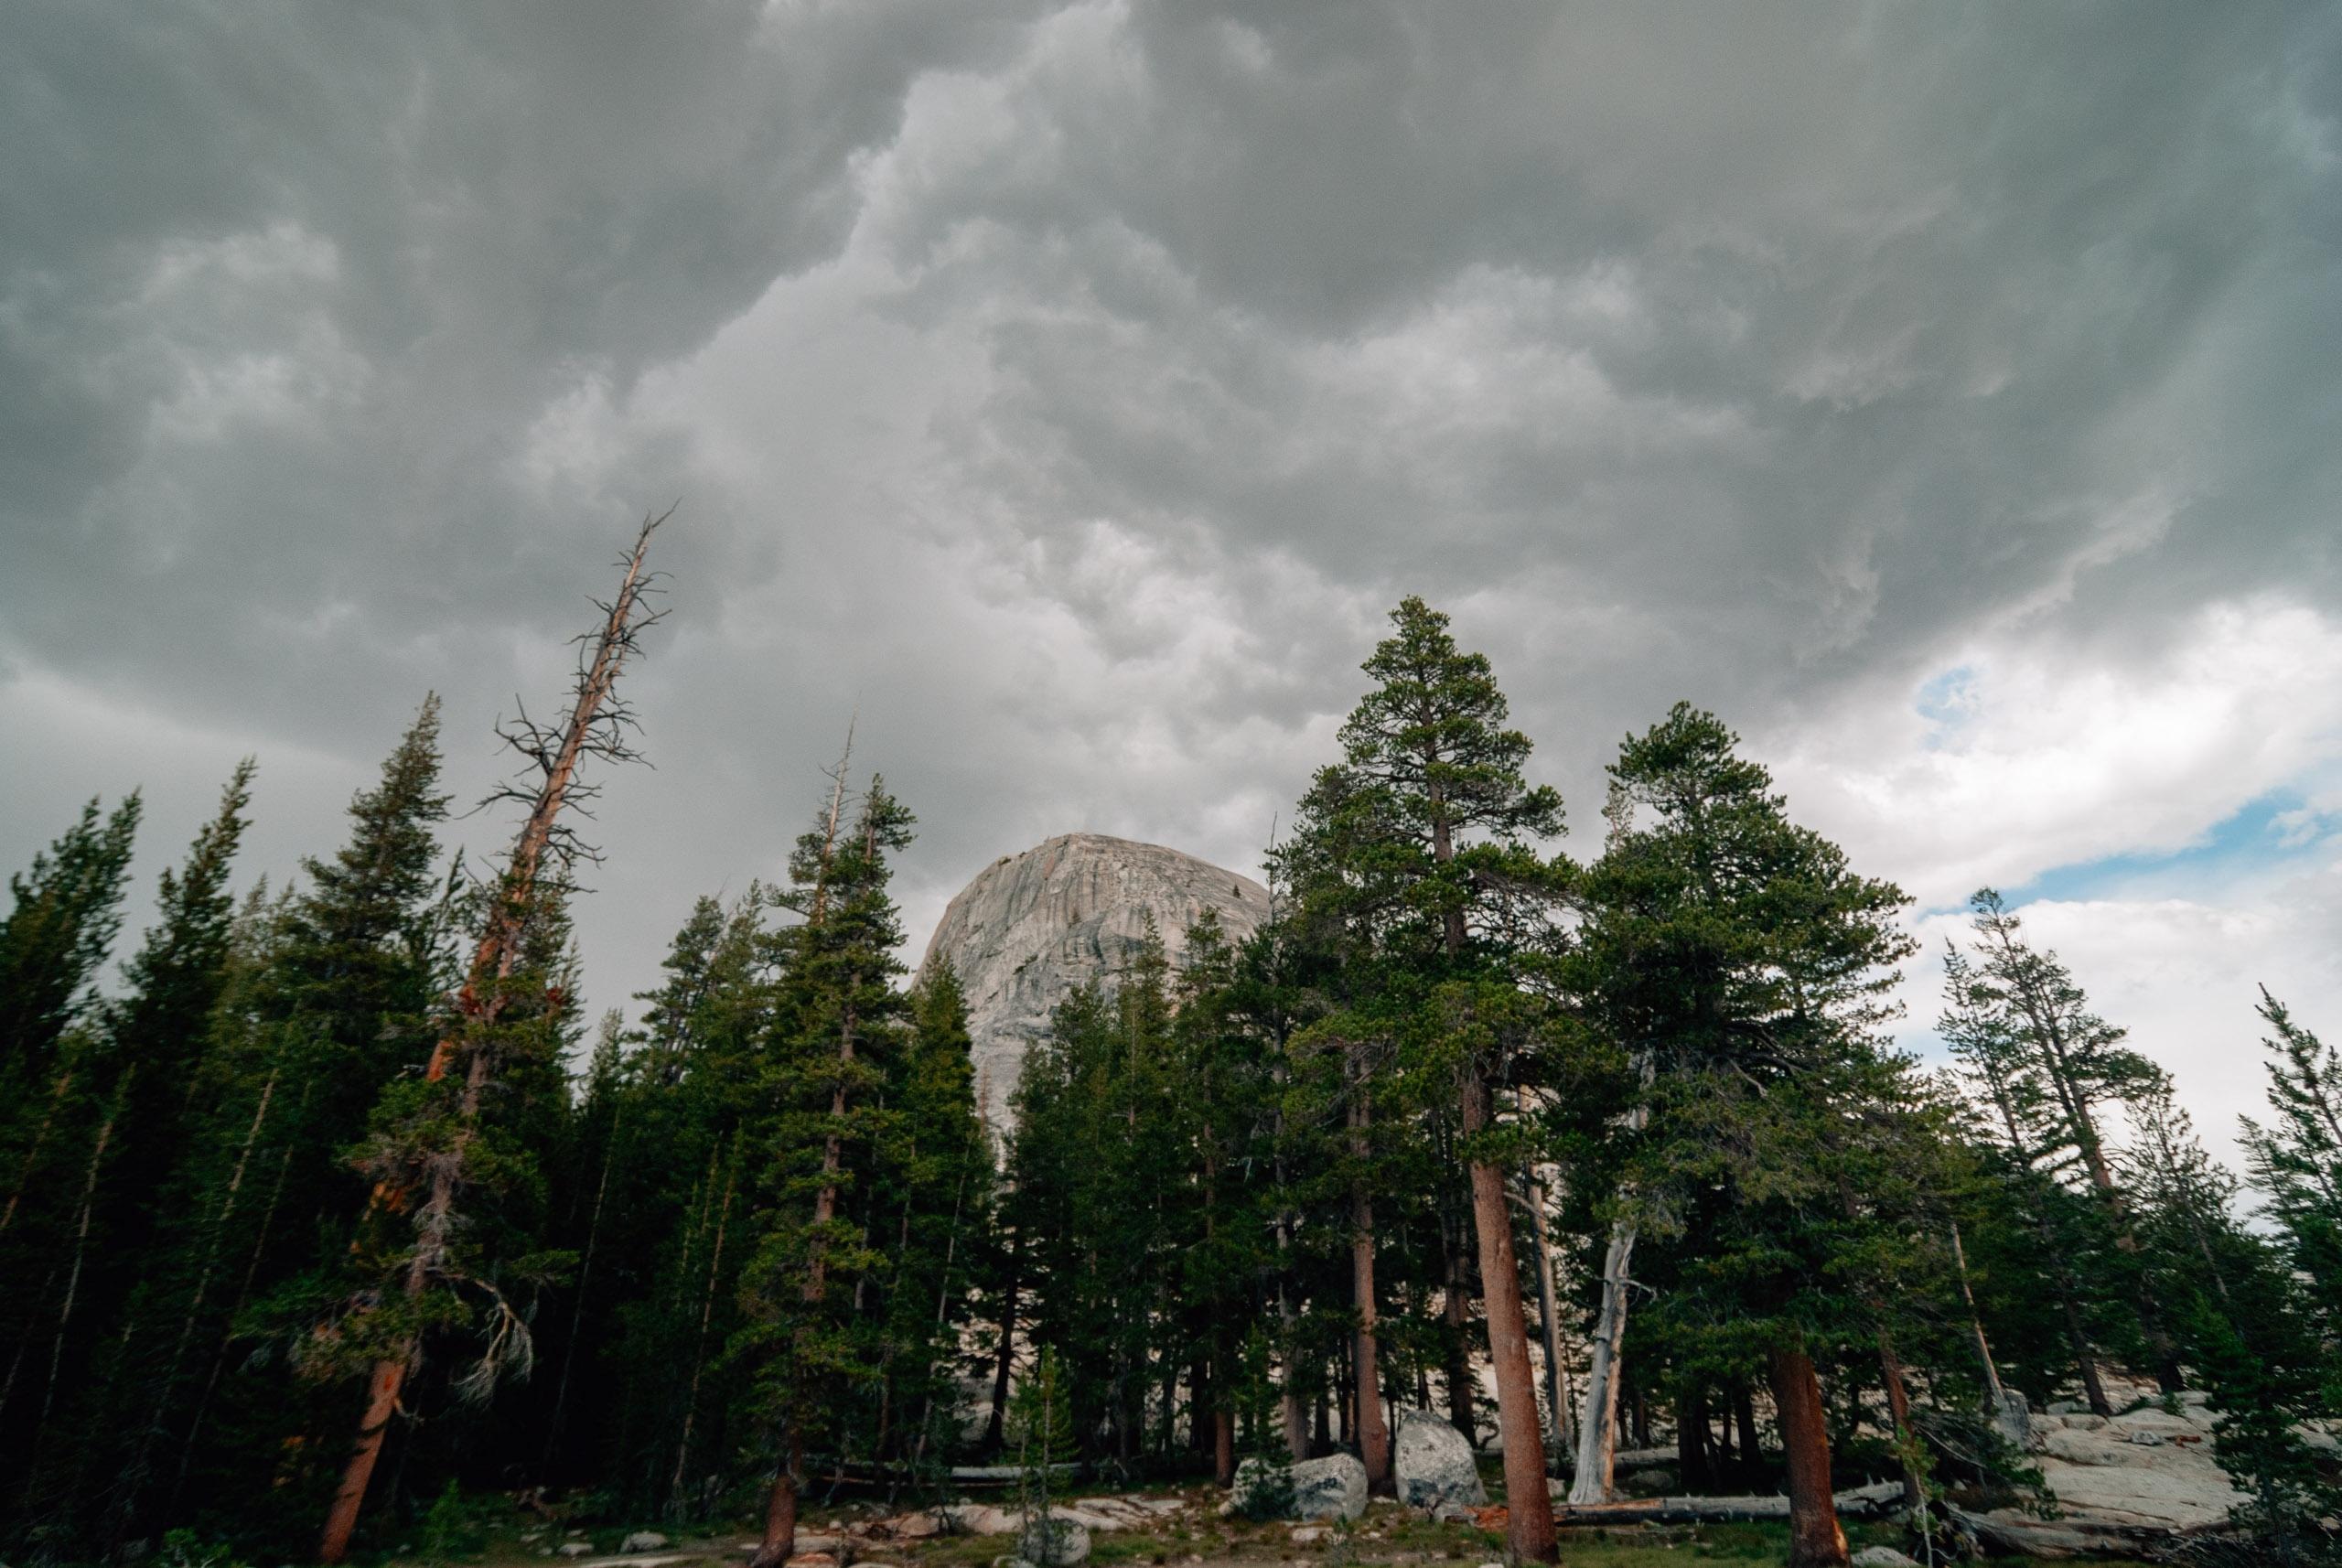 Yosemite National Park - 2010-0723-DSC_0111_95422